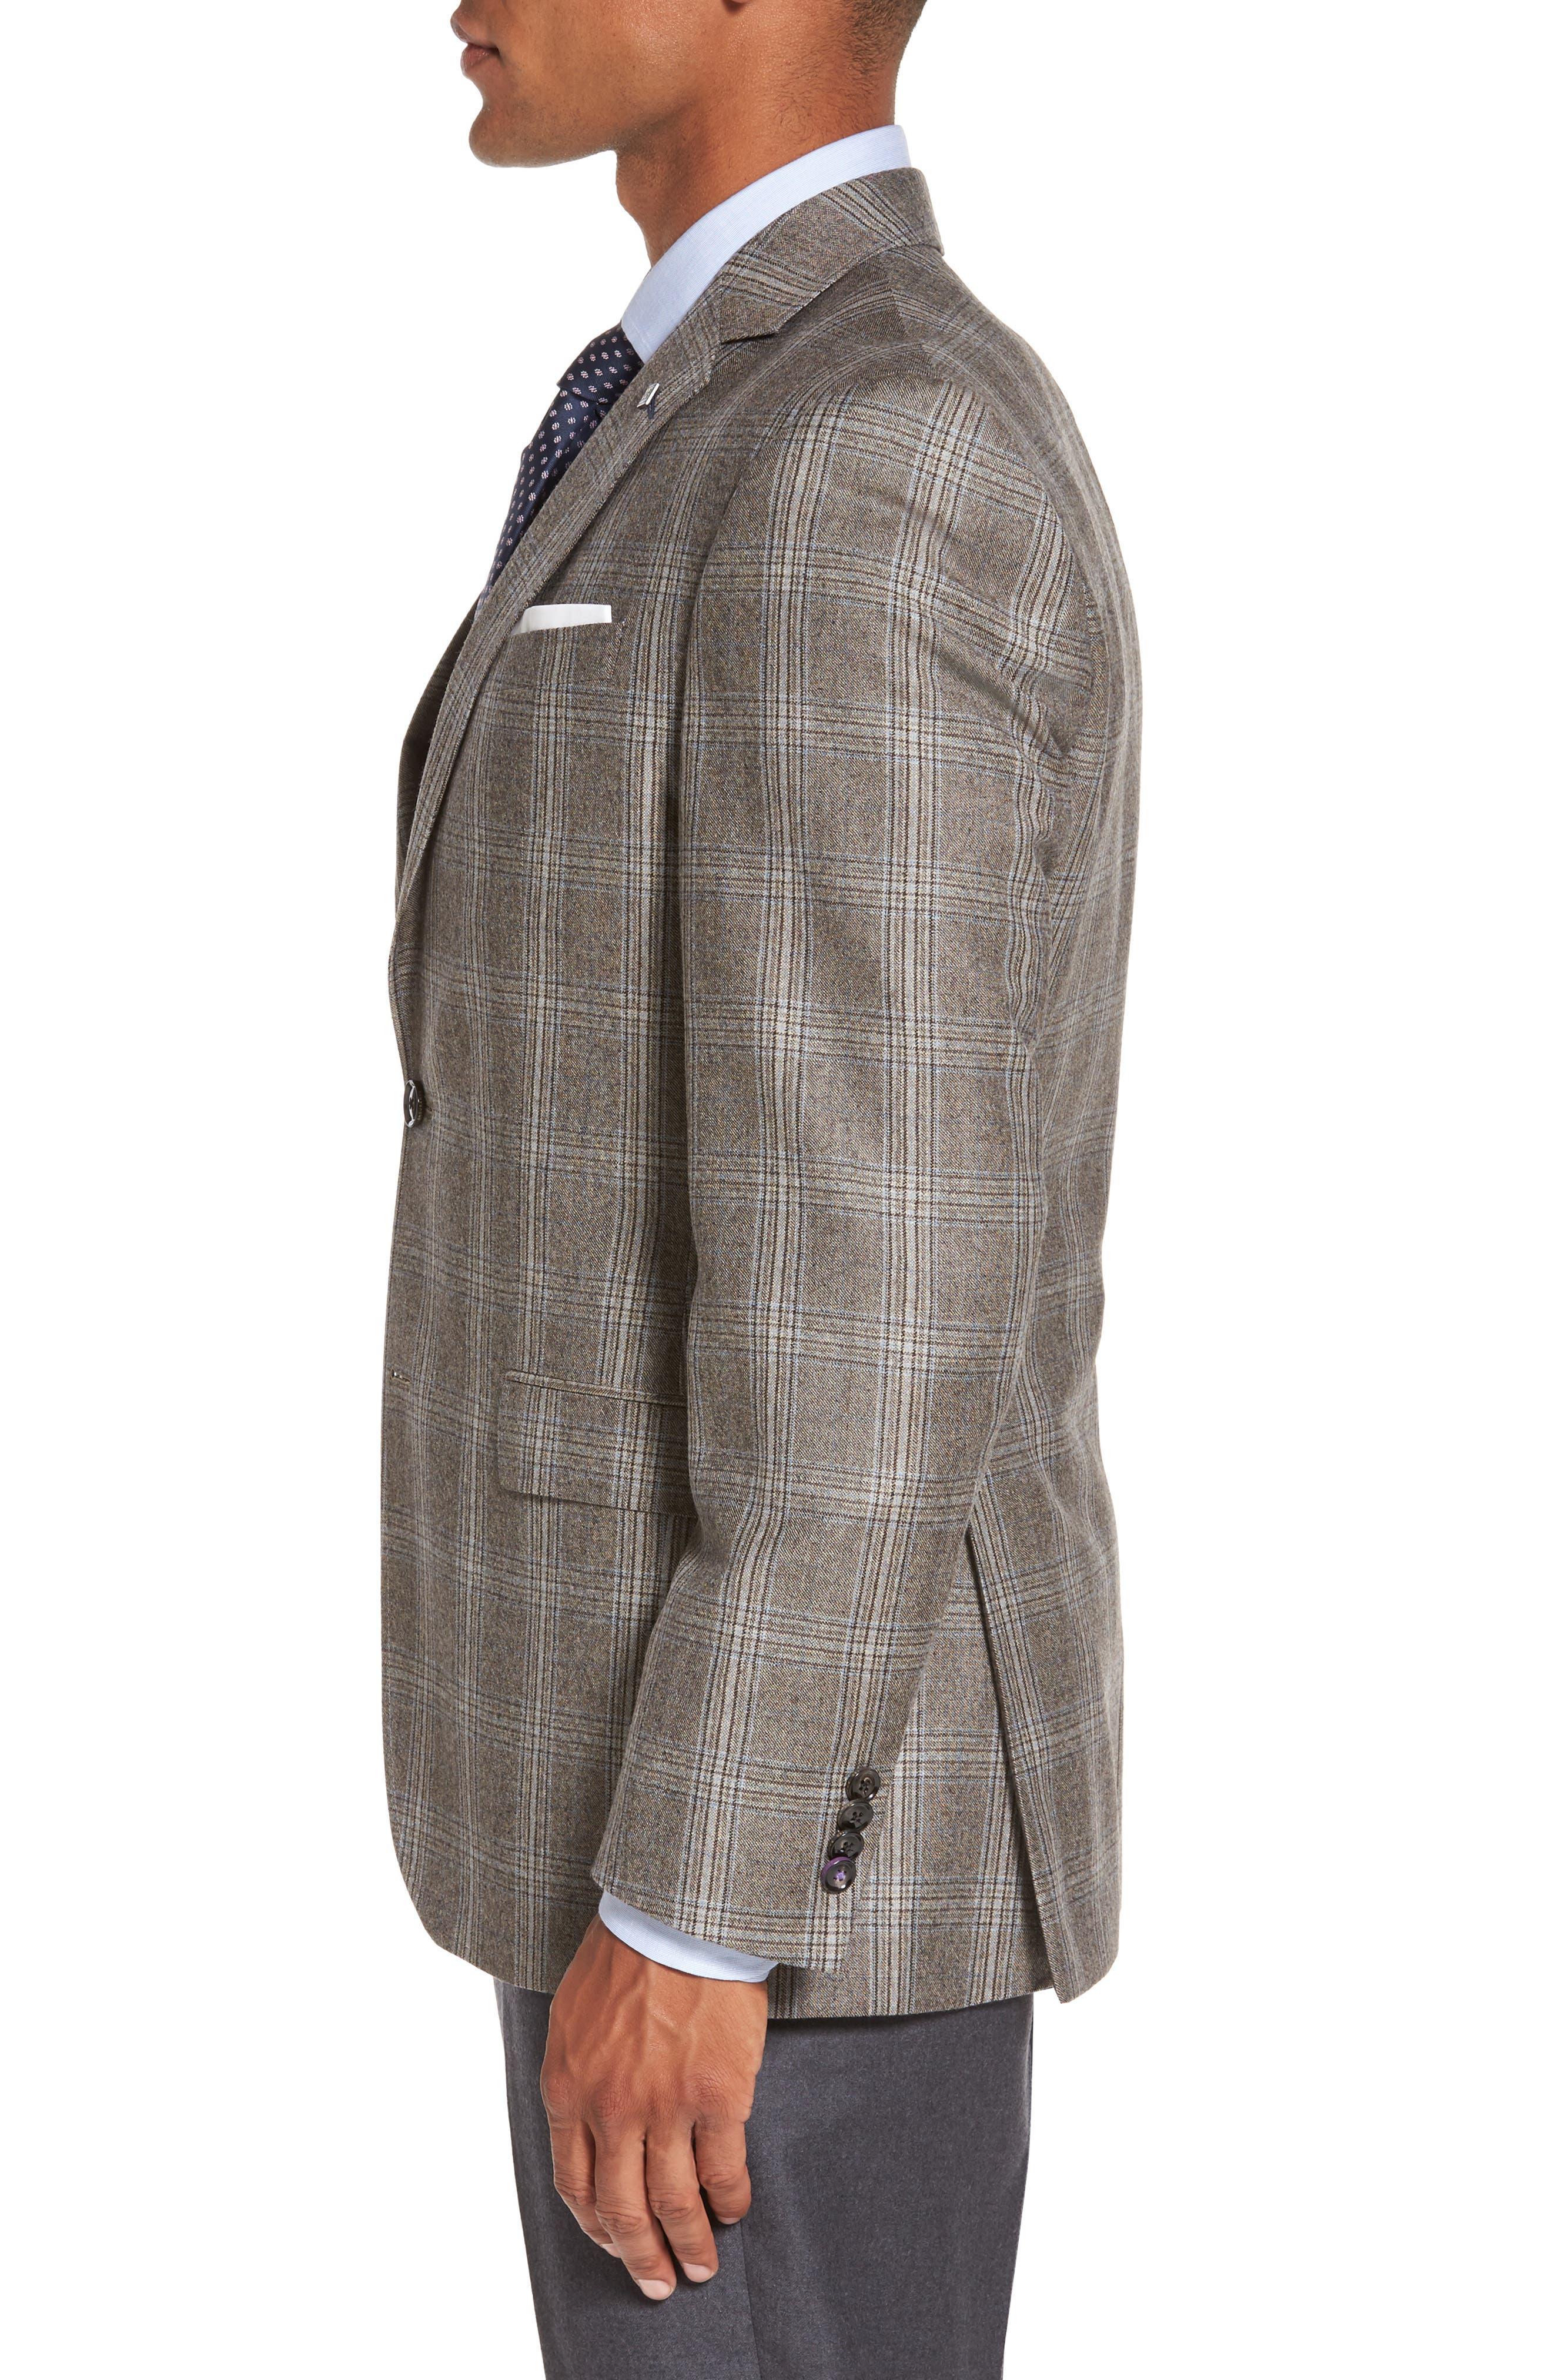 Jay Trim Fit Plaid Wool Sport Coat,                             Alternate thumbnail 3, color,                             230